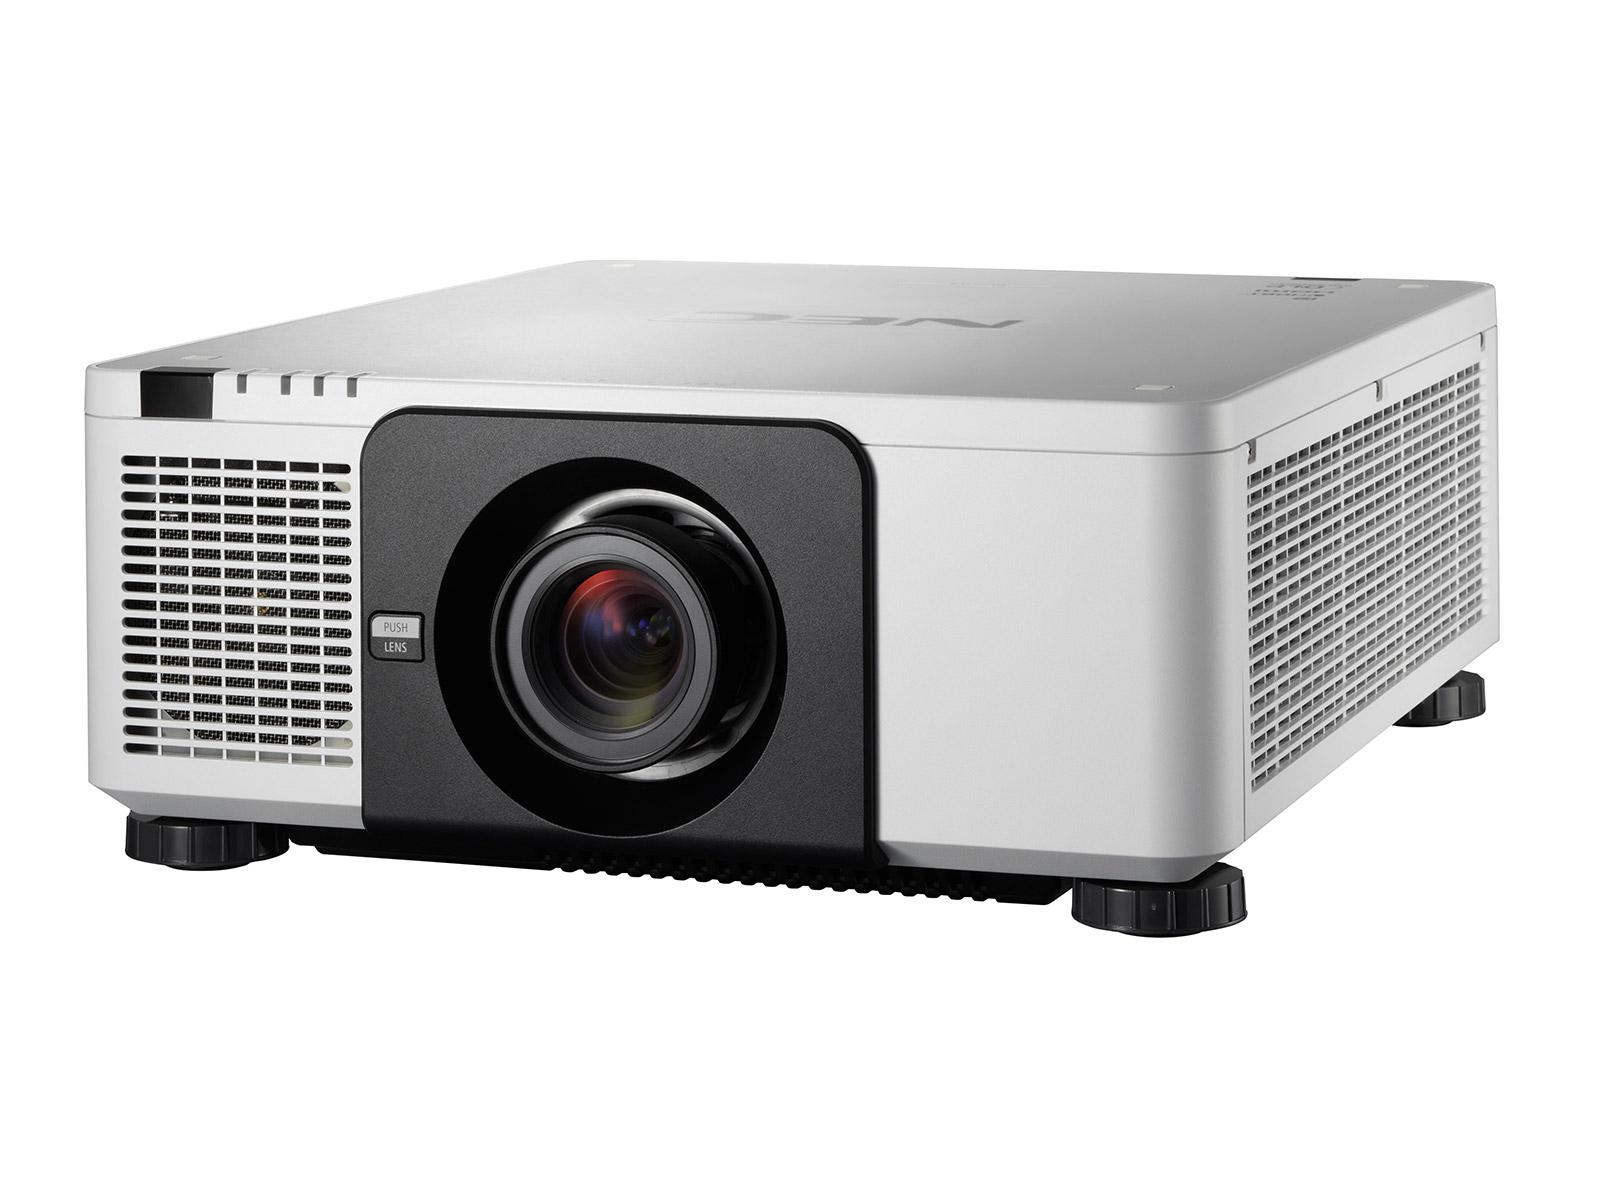 NEC PX1004UL 10000ANSI lumens DLP WUXGA (1920x1200) Desktop projector White